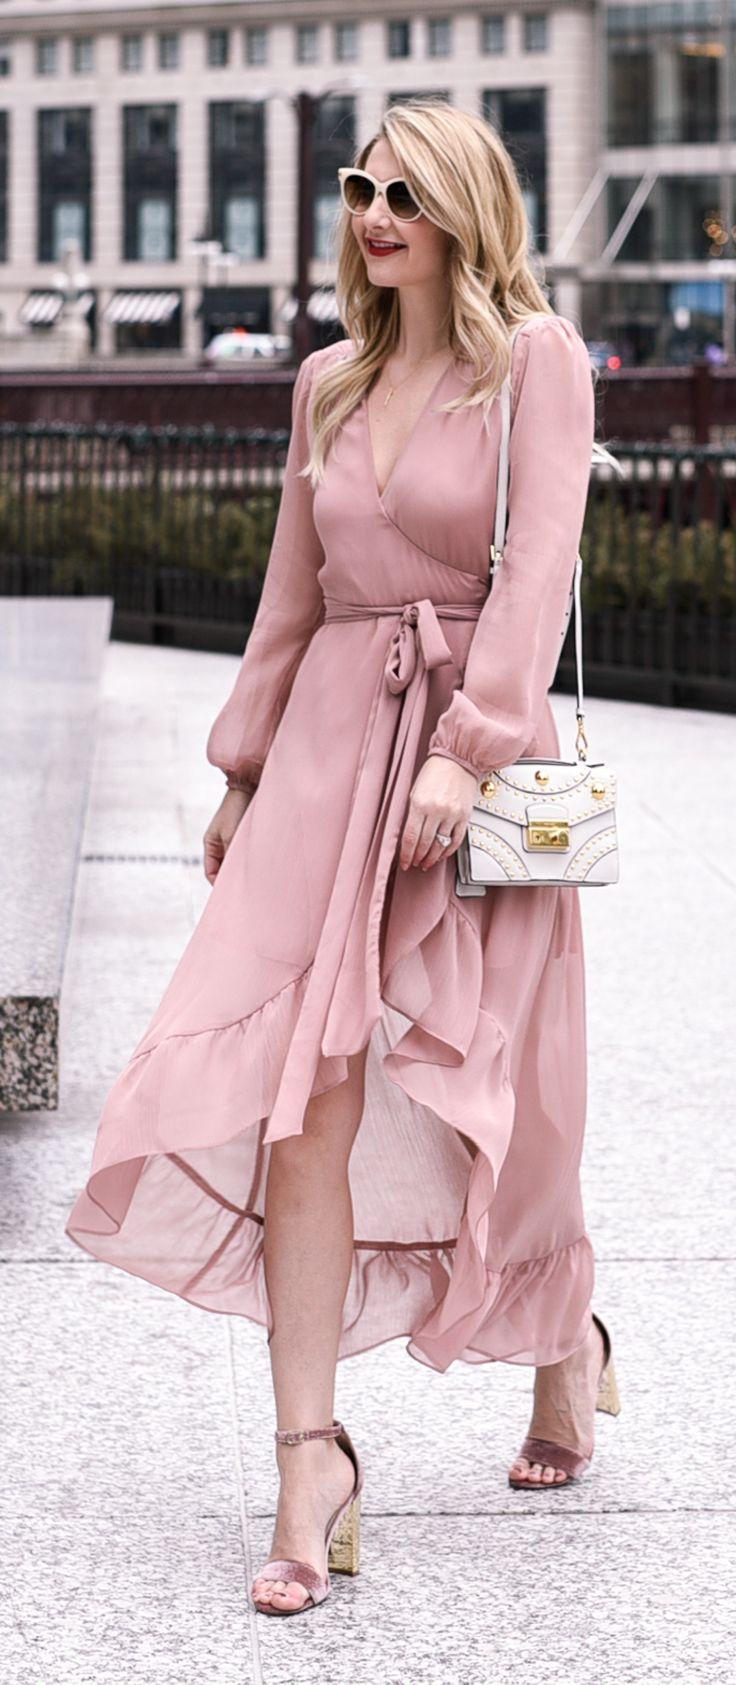 Blush ruffled wrap dress.